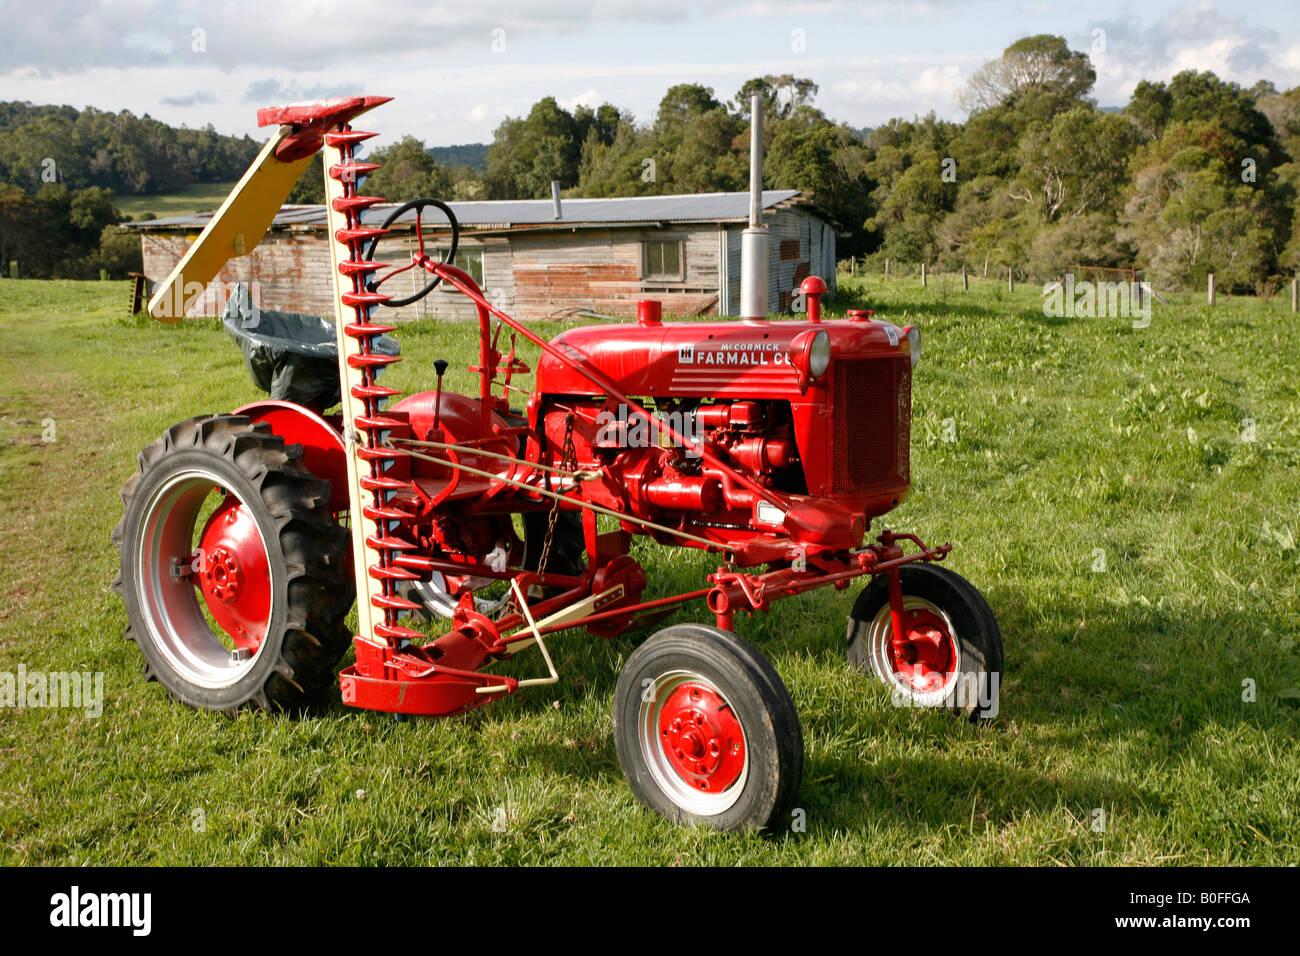 Restored Ih Tractors : A restored antique international farmall cub tractor